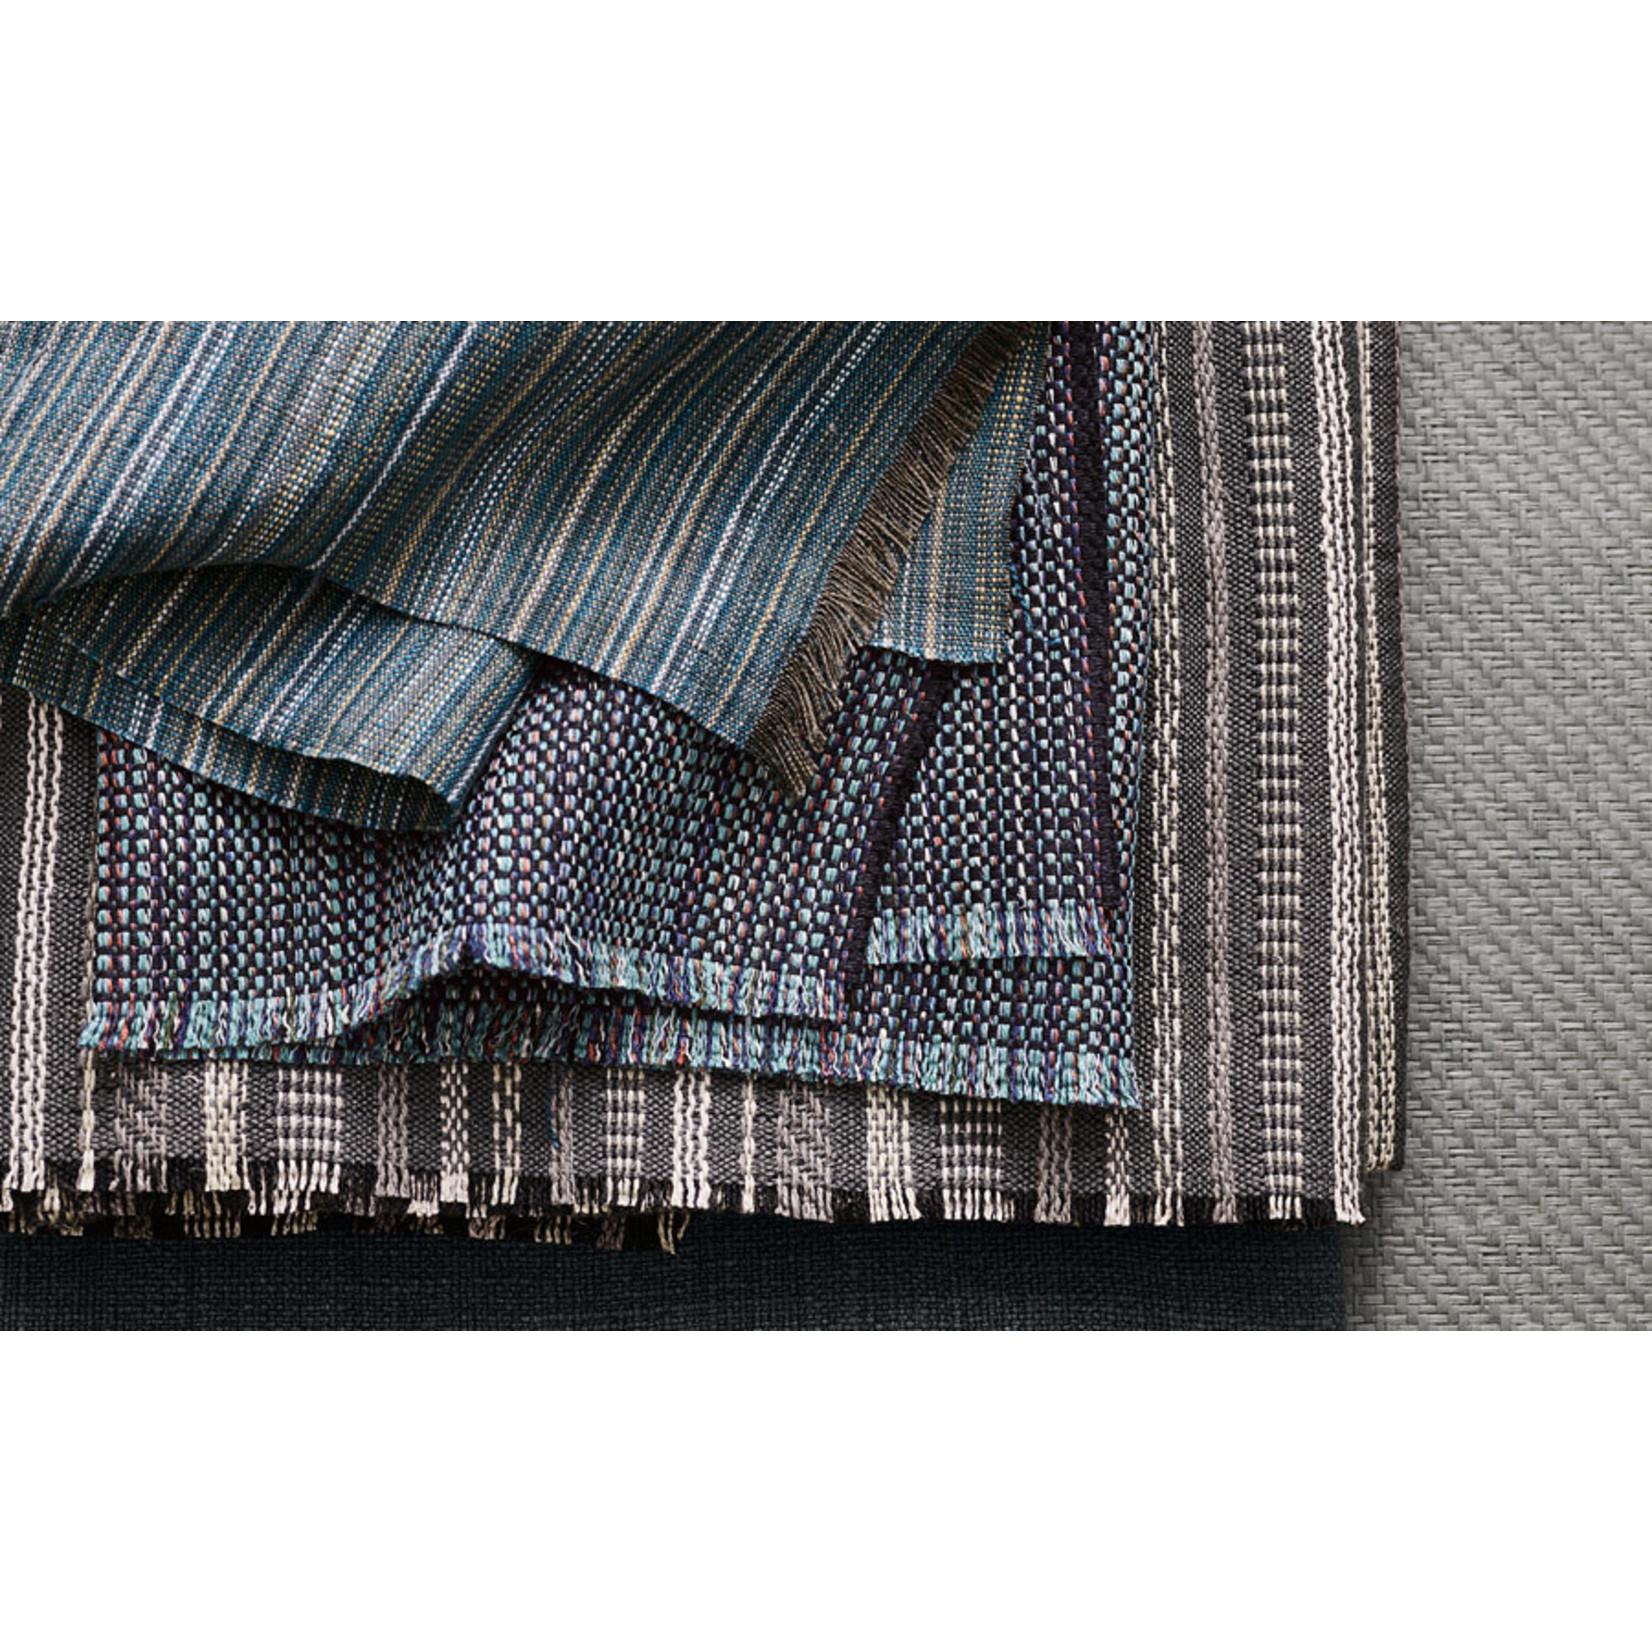 Mark Alexander Paperweave Handwoven Wallcoverings | Paper Greenware